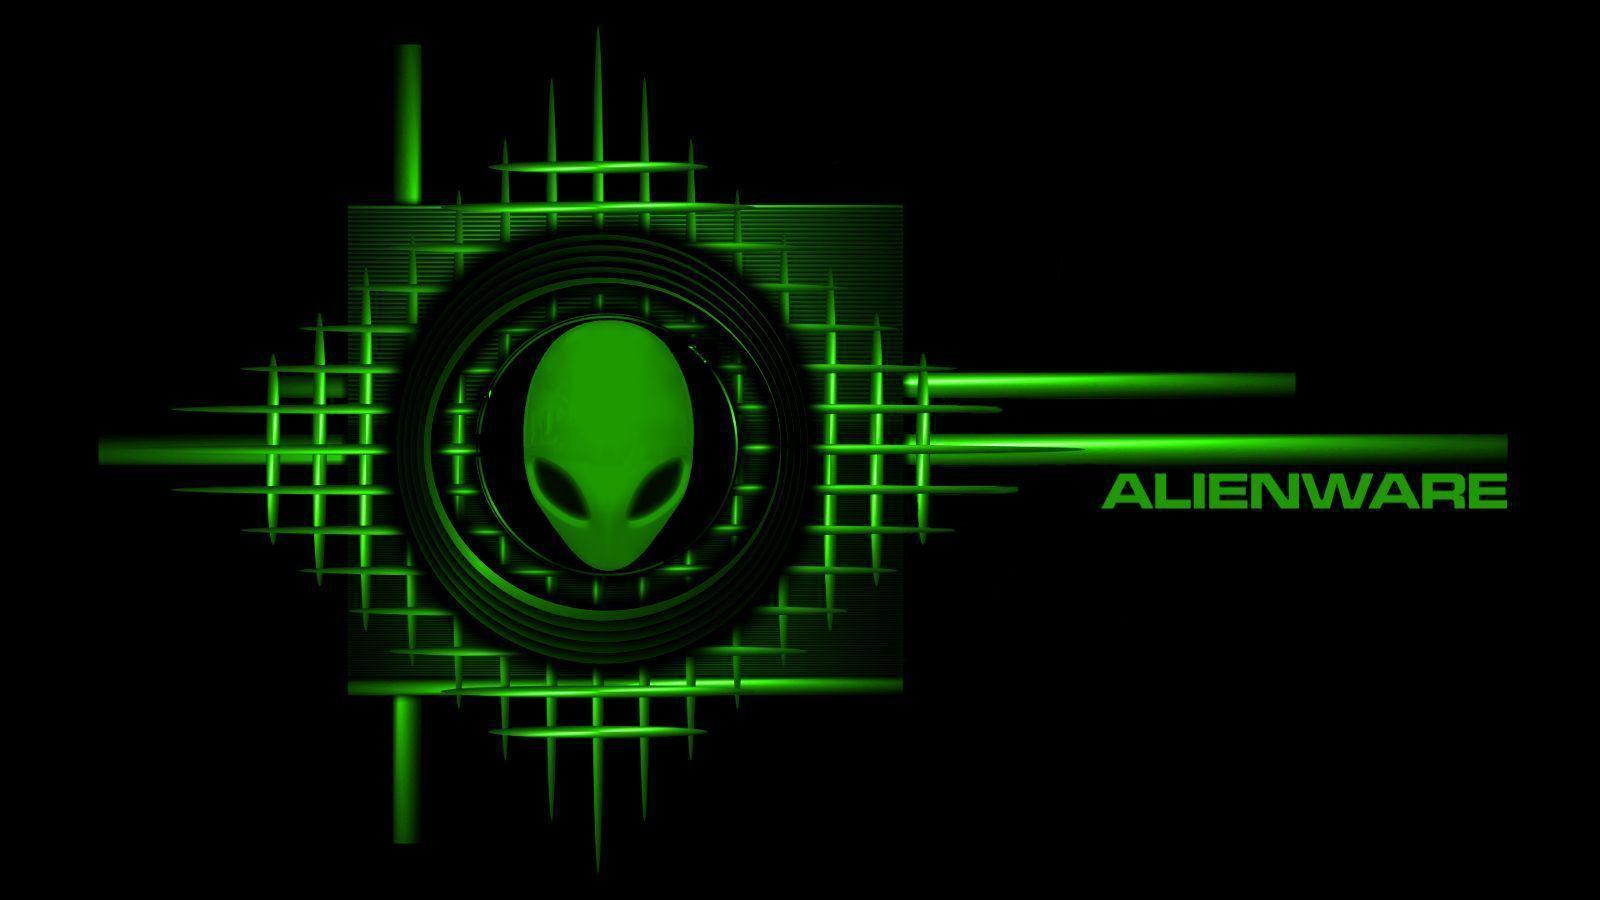 alienware wallpaper green hd - photo #22